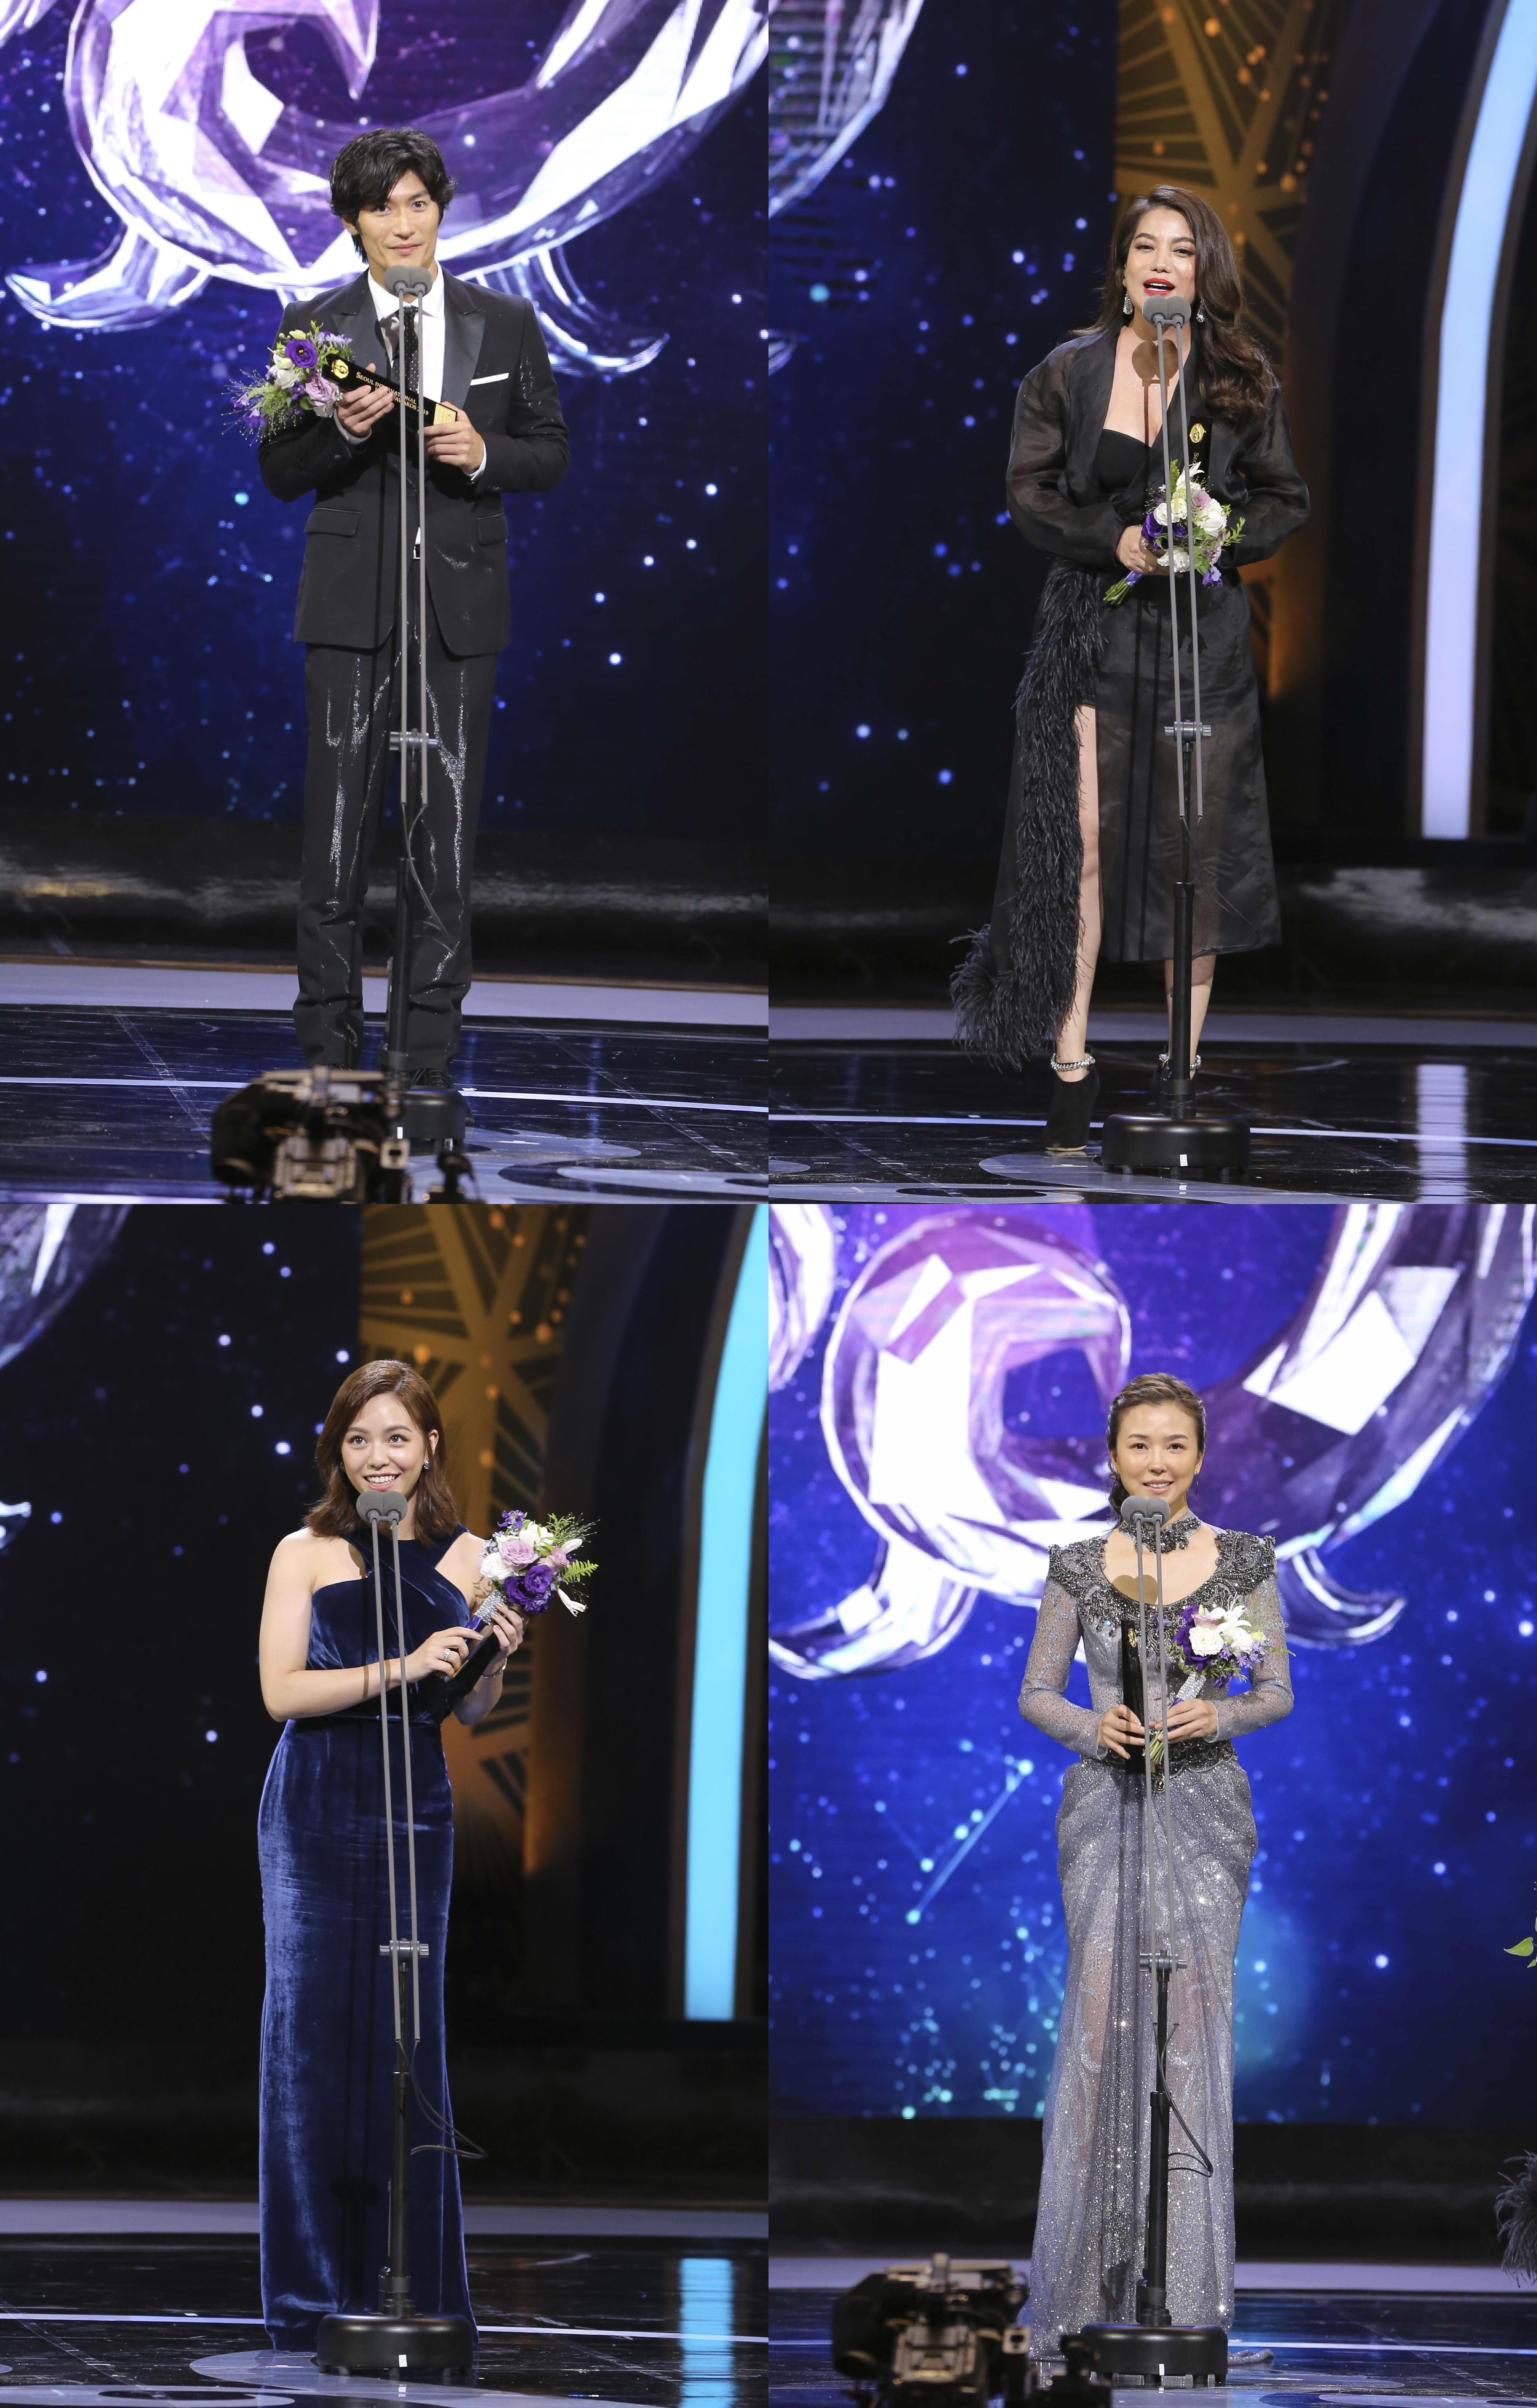 Mirua Haruma Truong Ngoc Anh Xingtong Yao Vivian Sung